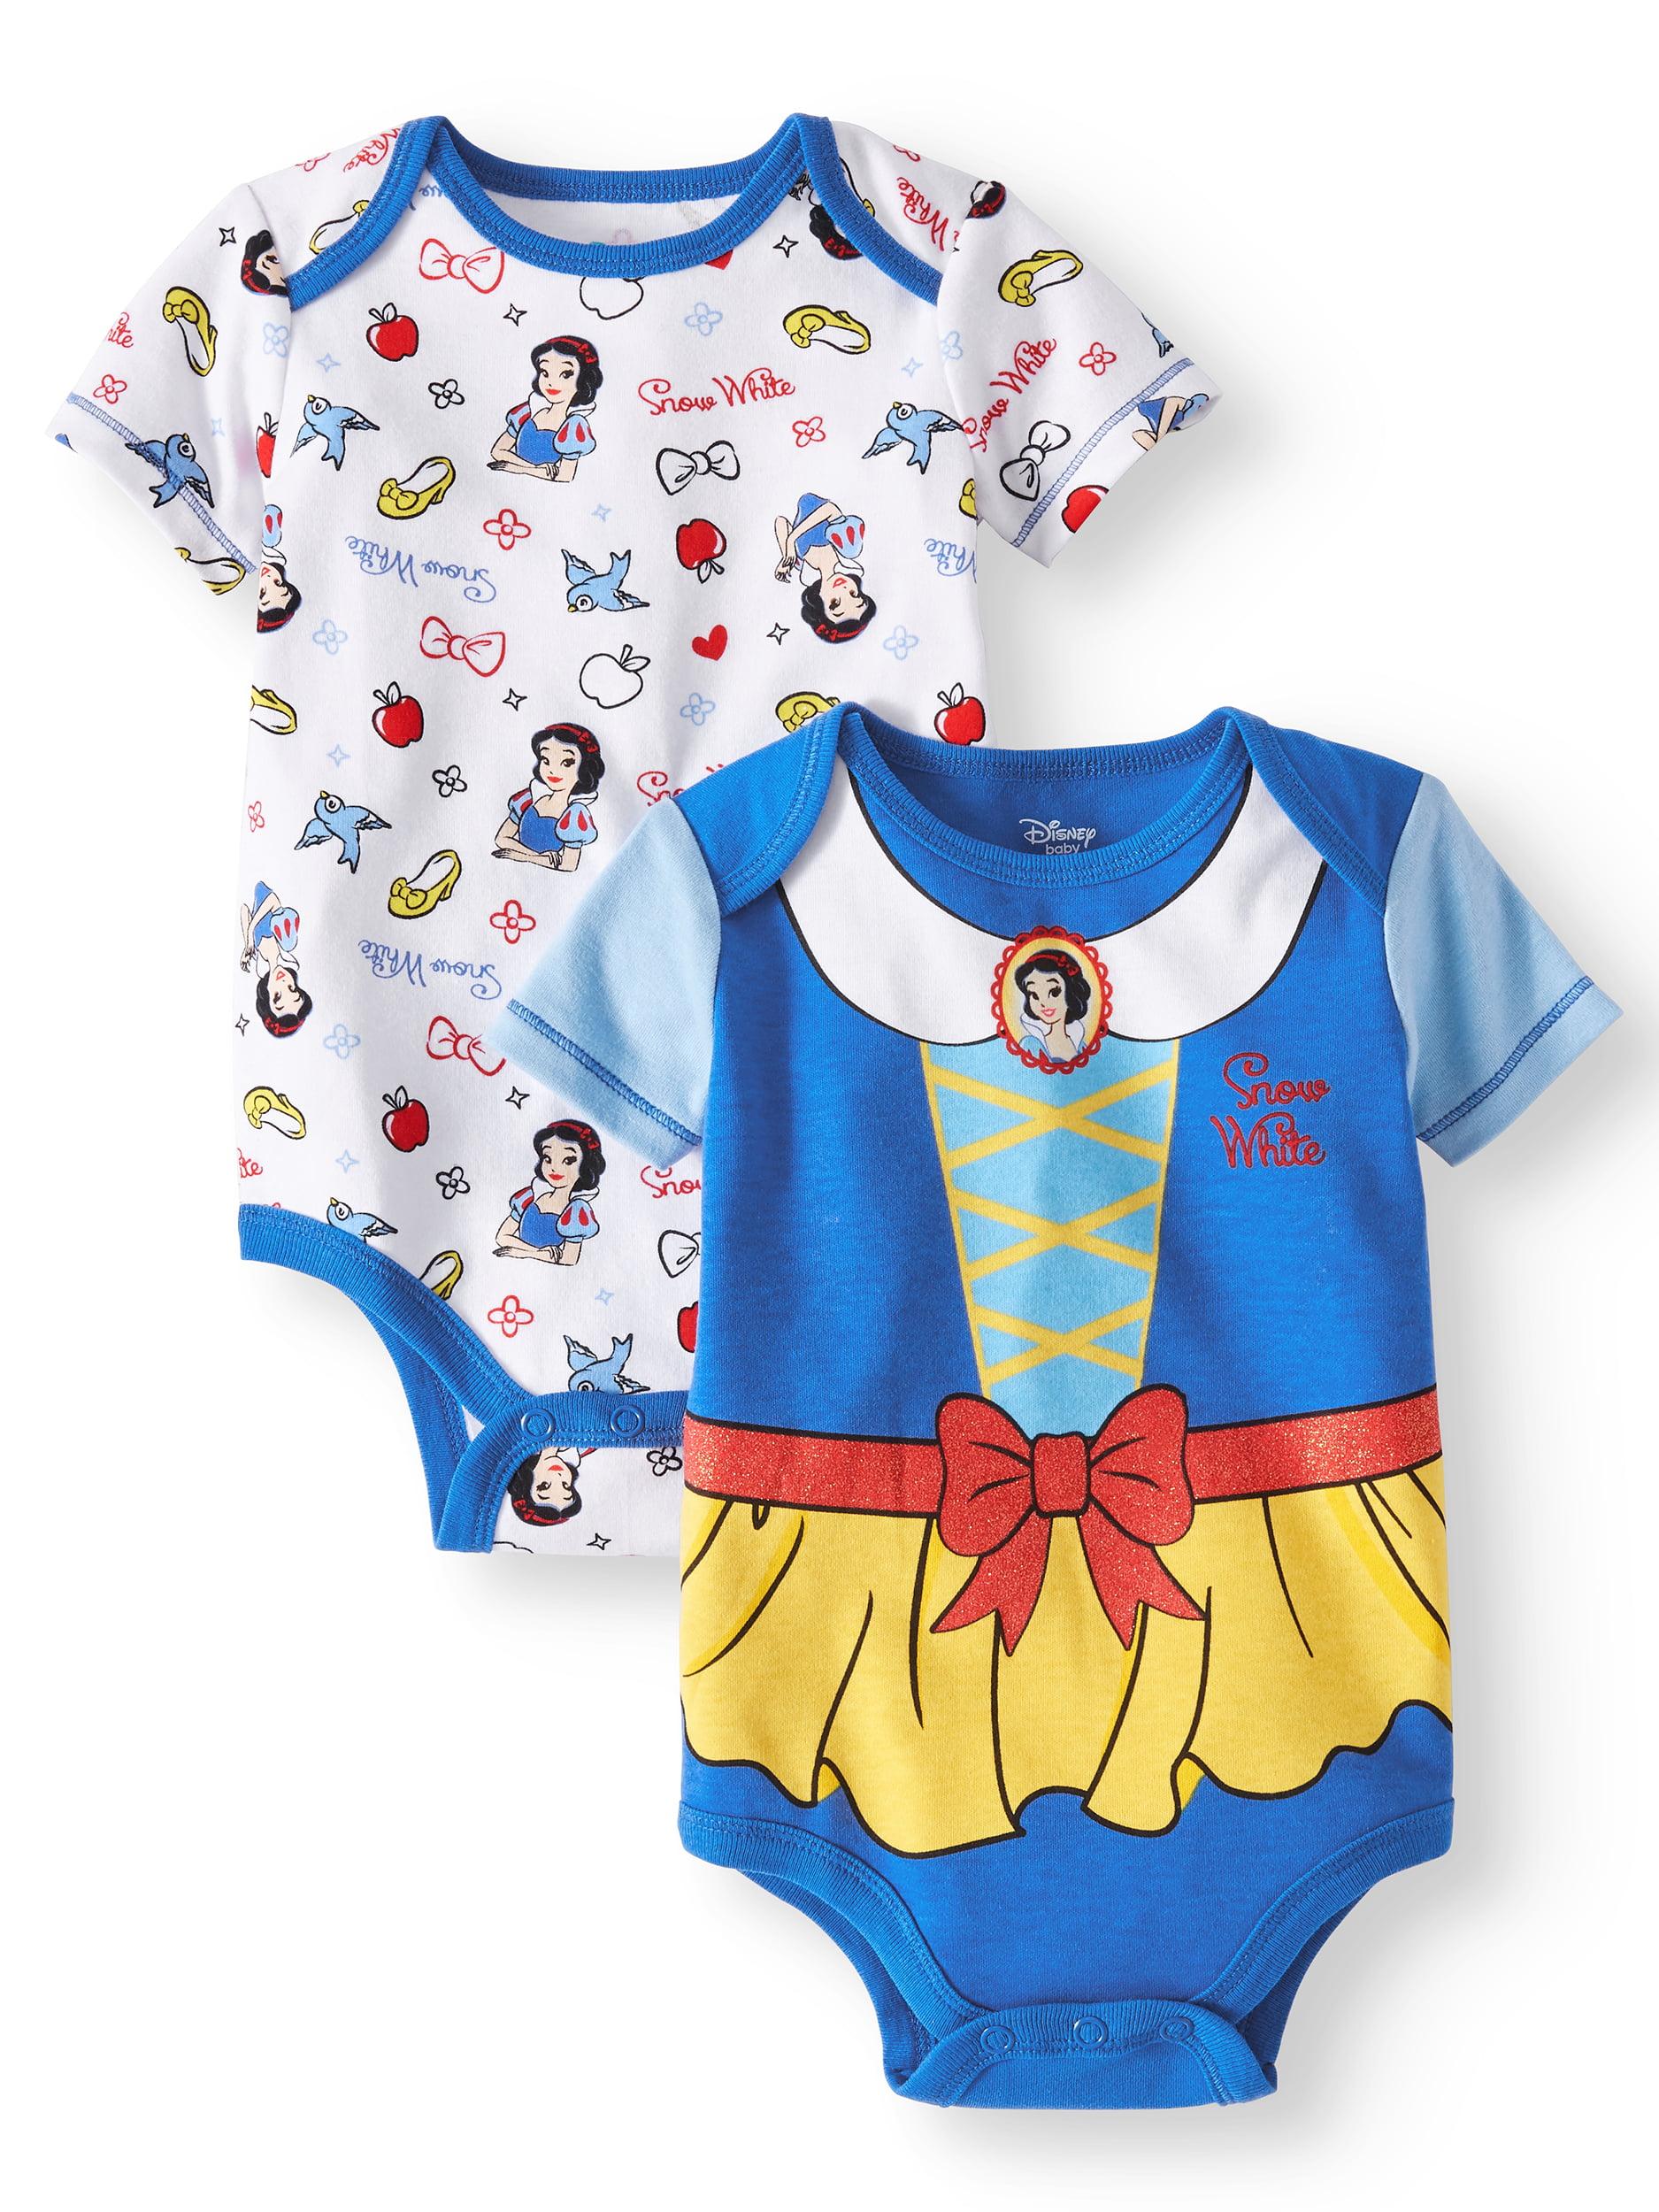 Snow White Graphic Bodysuits, 2-pack (Baby Girls)